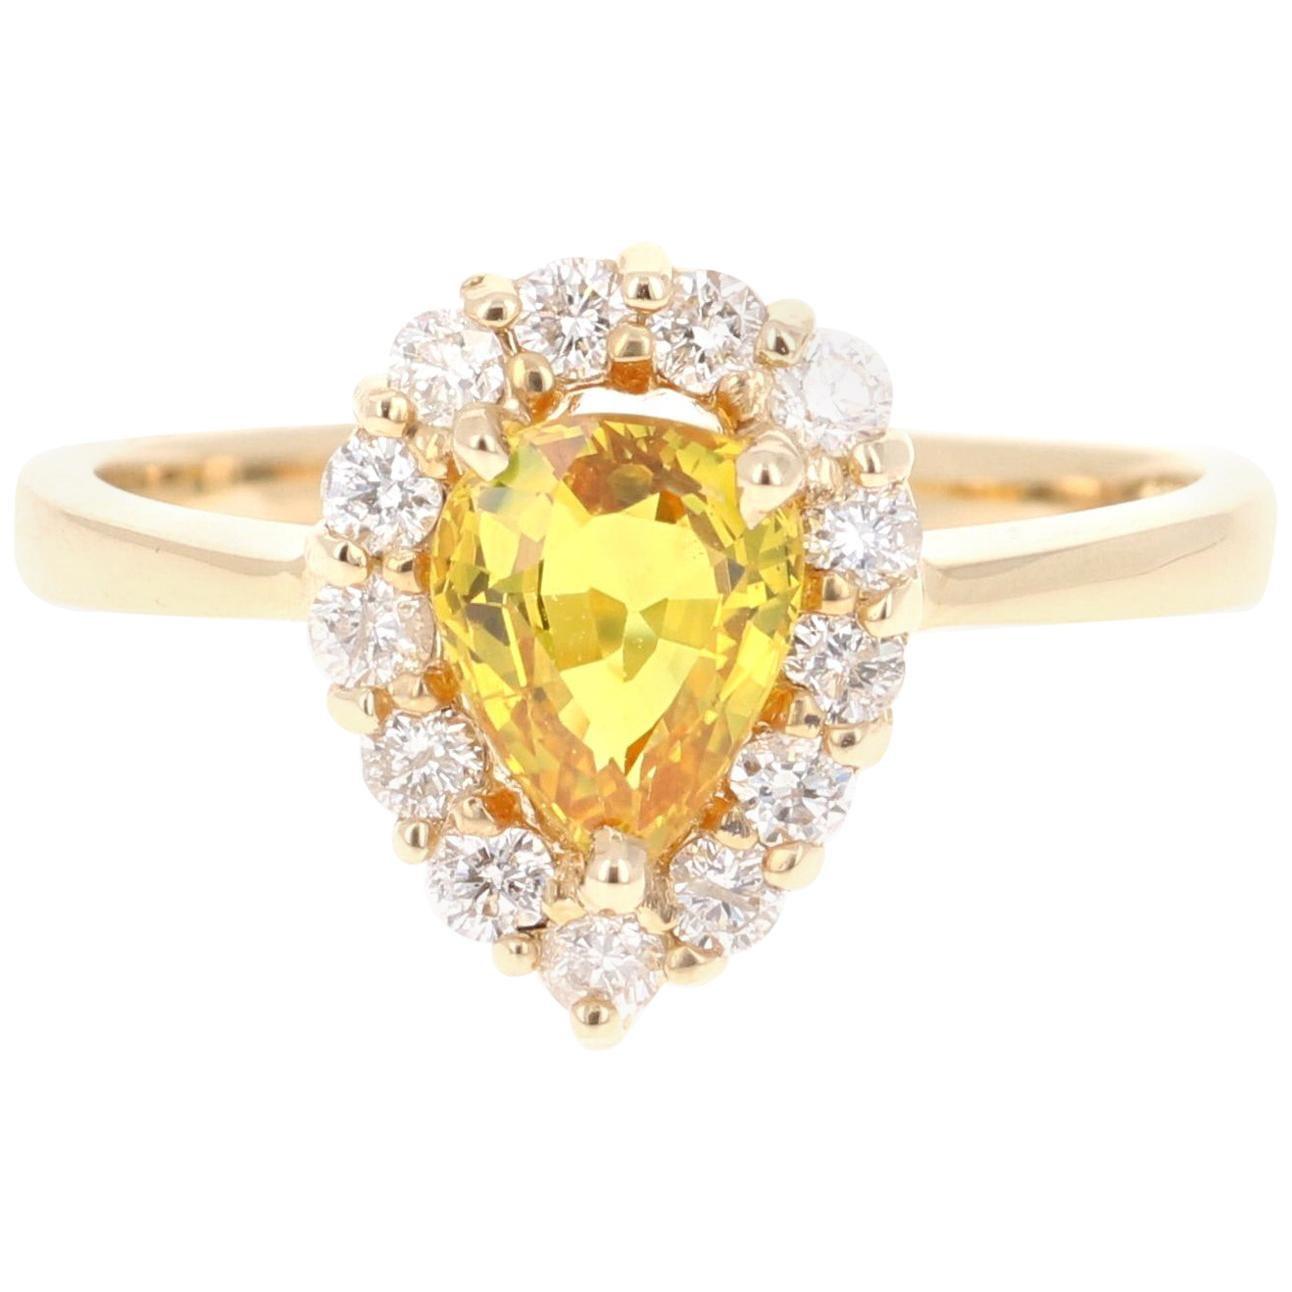 1.54 Carat Yellow Sapphire and Diamond 14 Karat Yellow Gold Ring